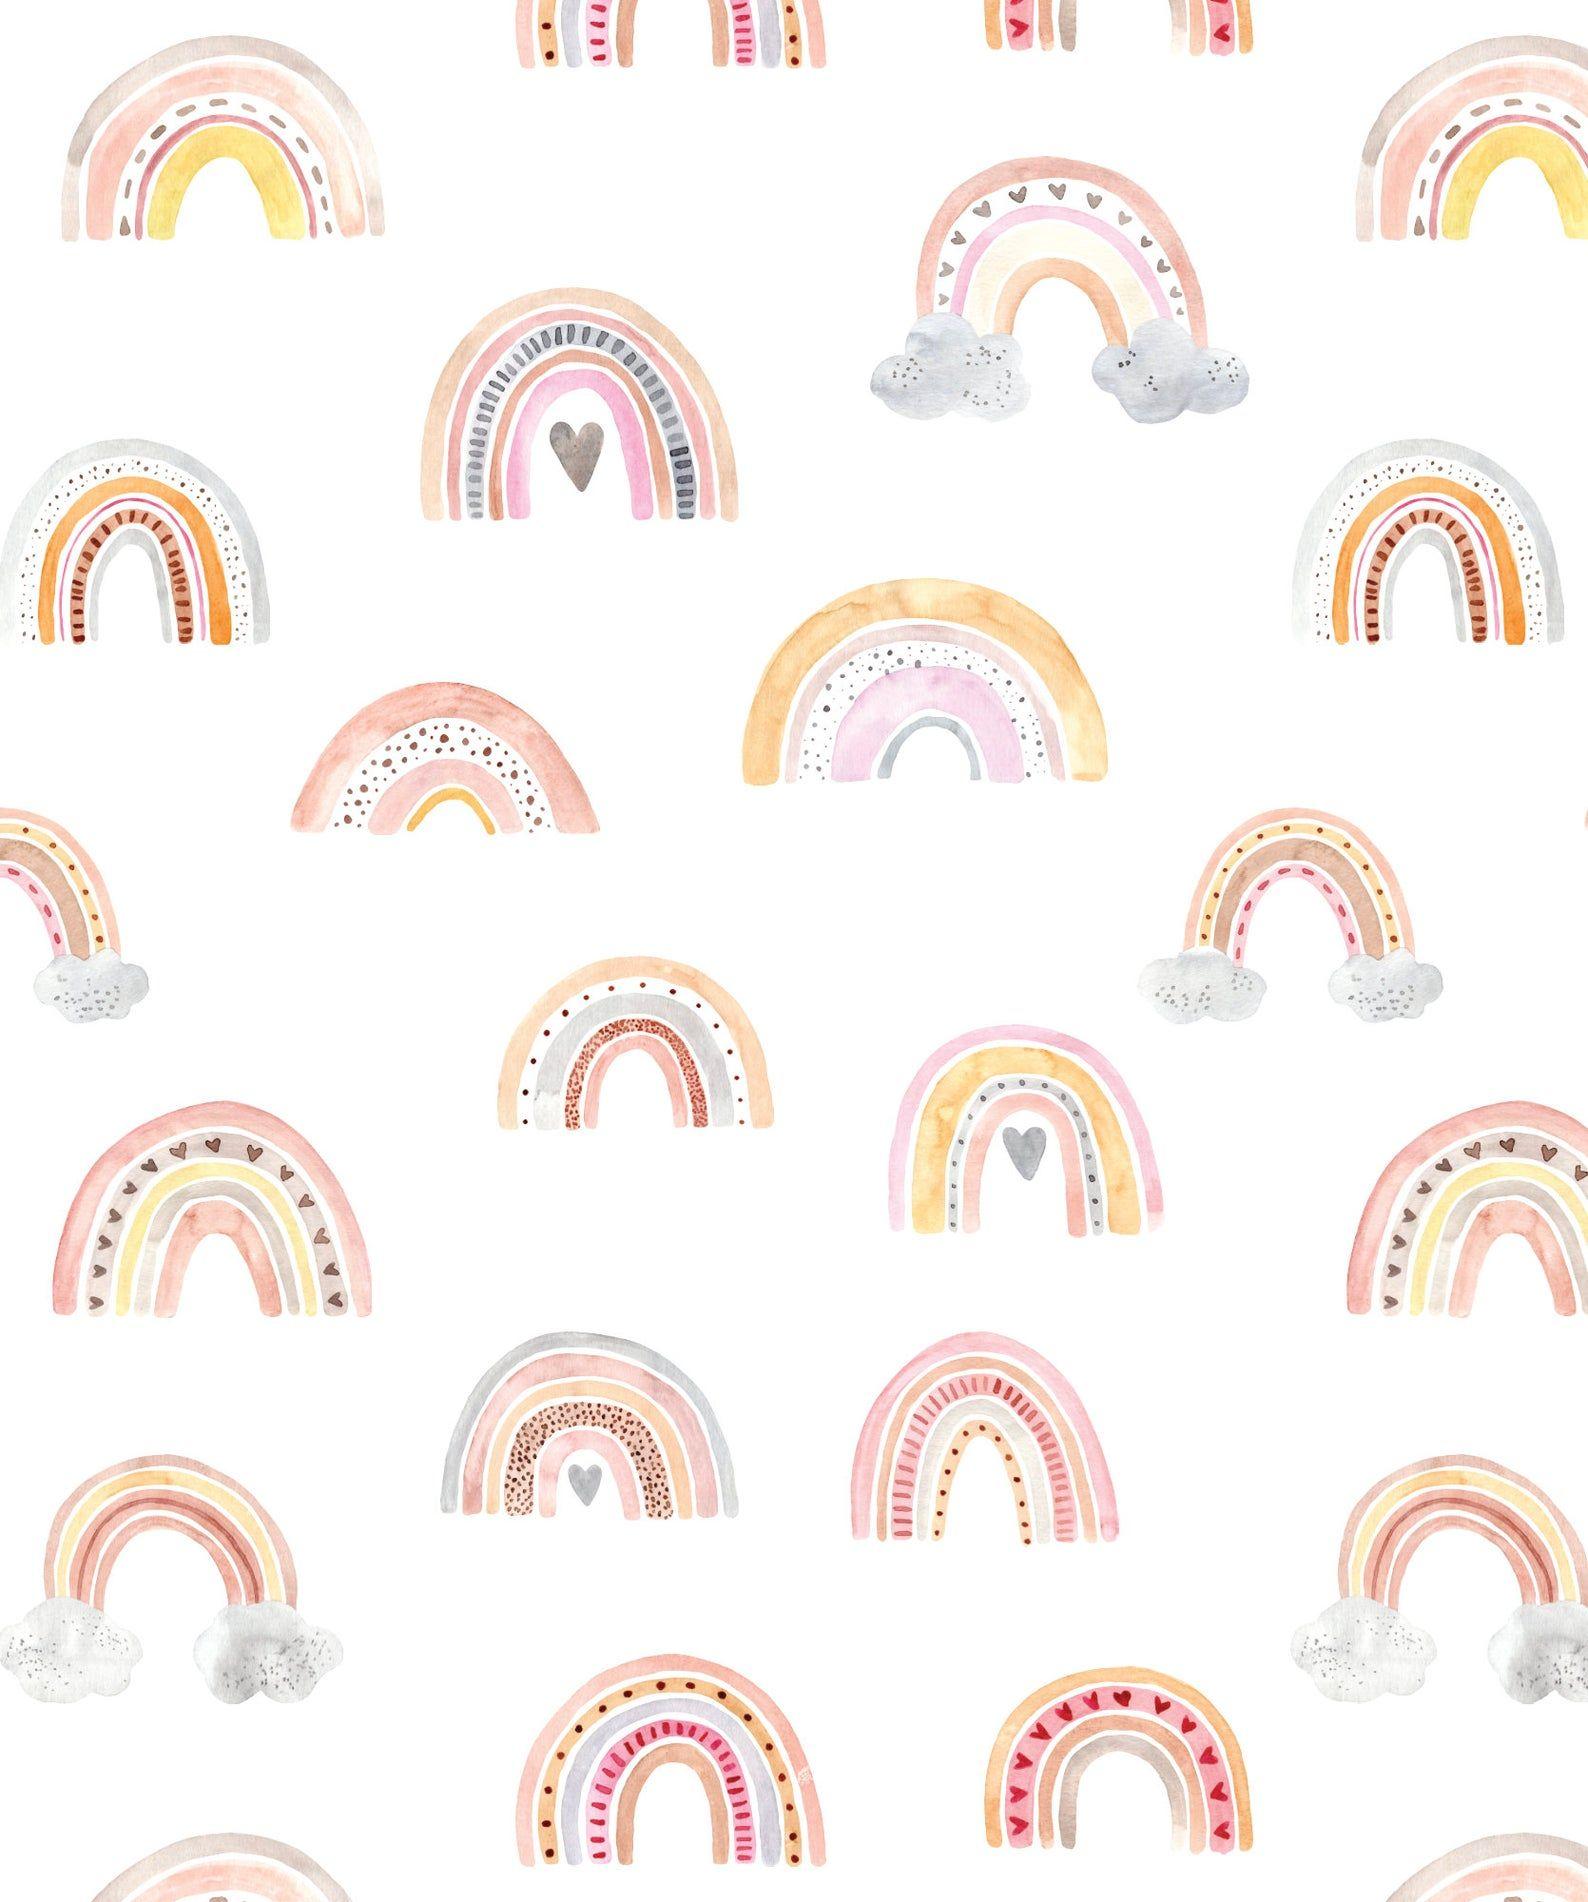 Whimsical Boho Watercolor Rainbow Wallpaper Removable Etsy In 2021 Rainbow Wallpaper Rainbow Wallpaper Iphone Peel And Stick Wallpaper